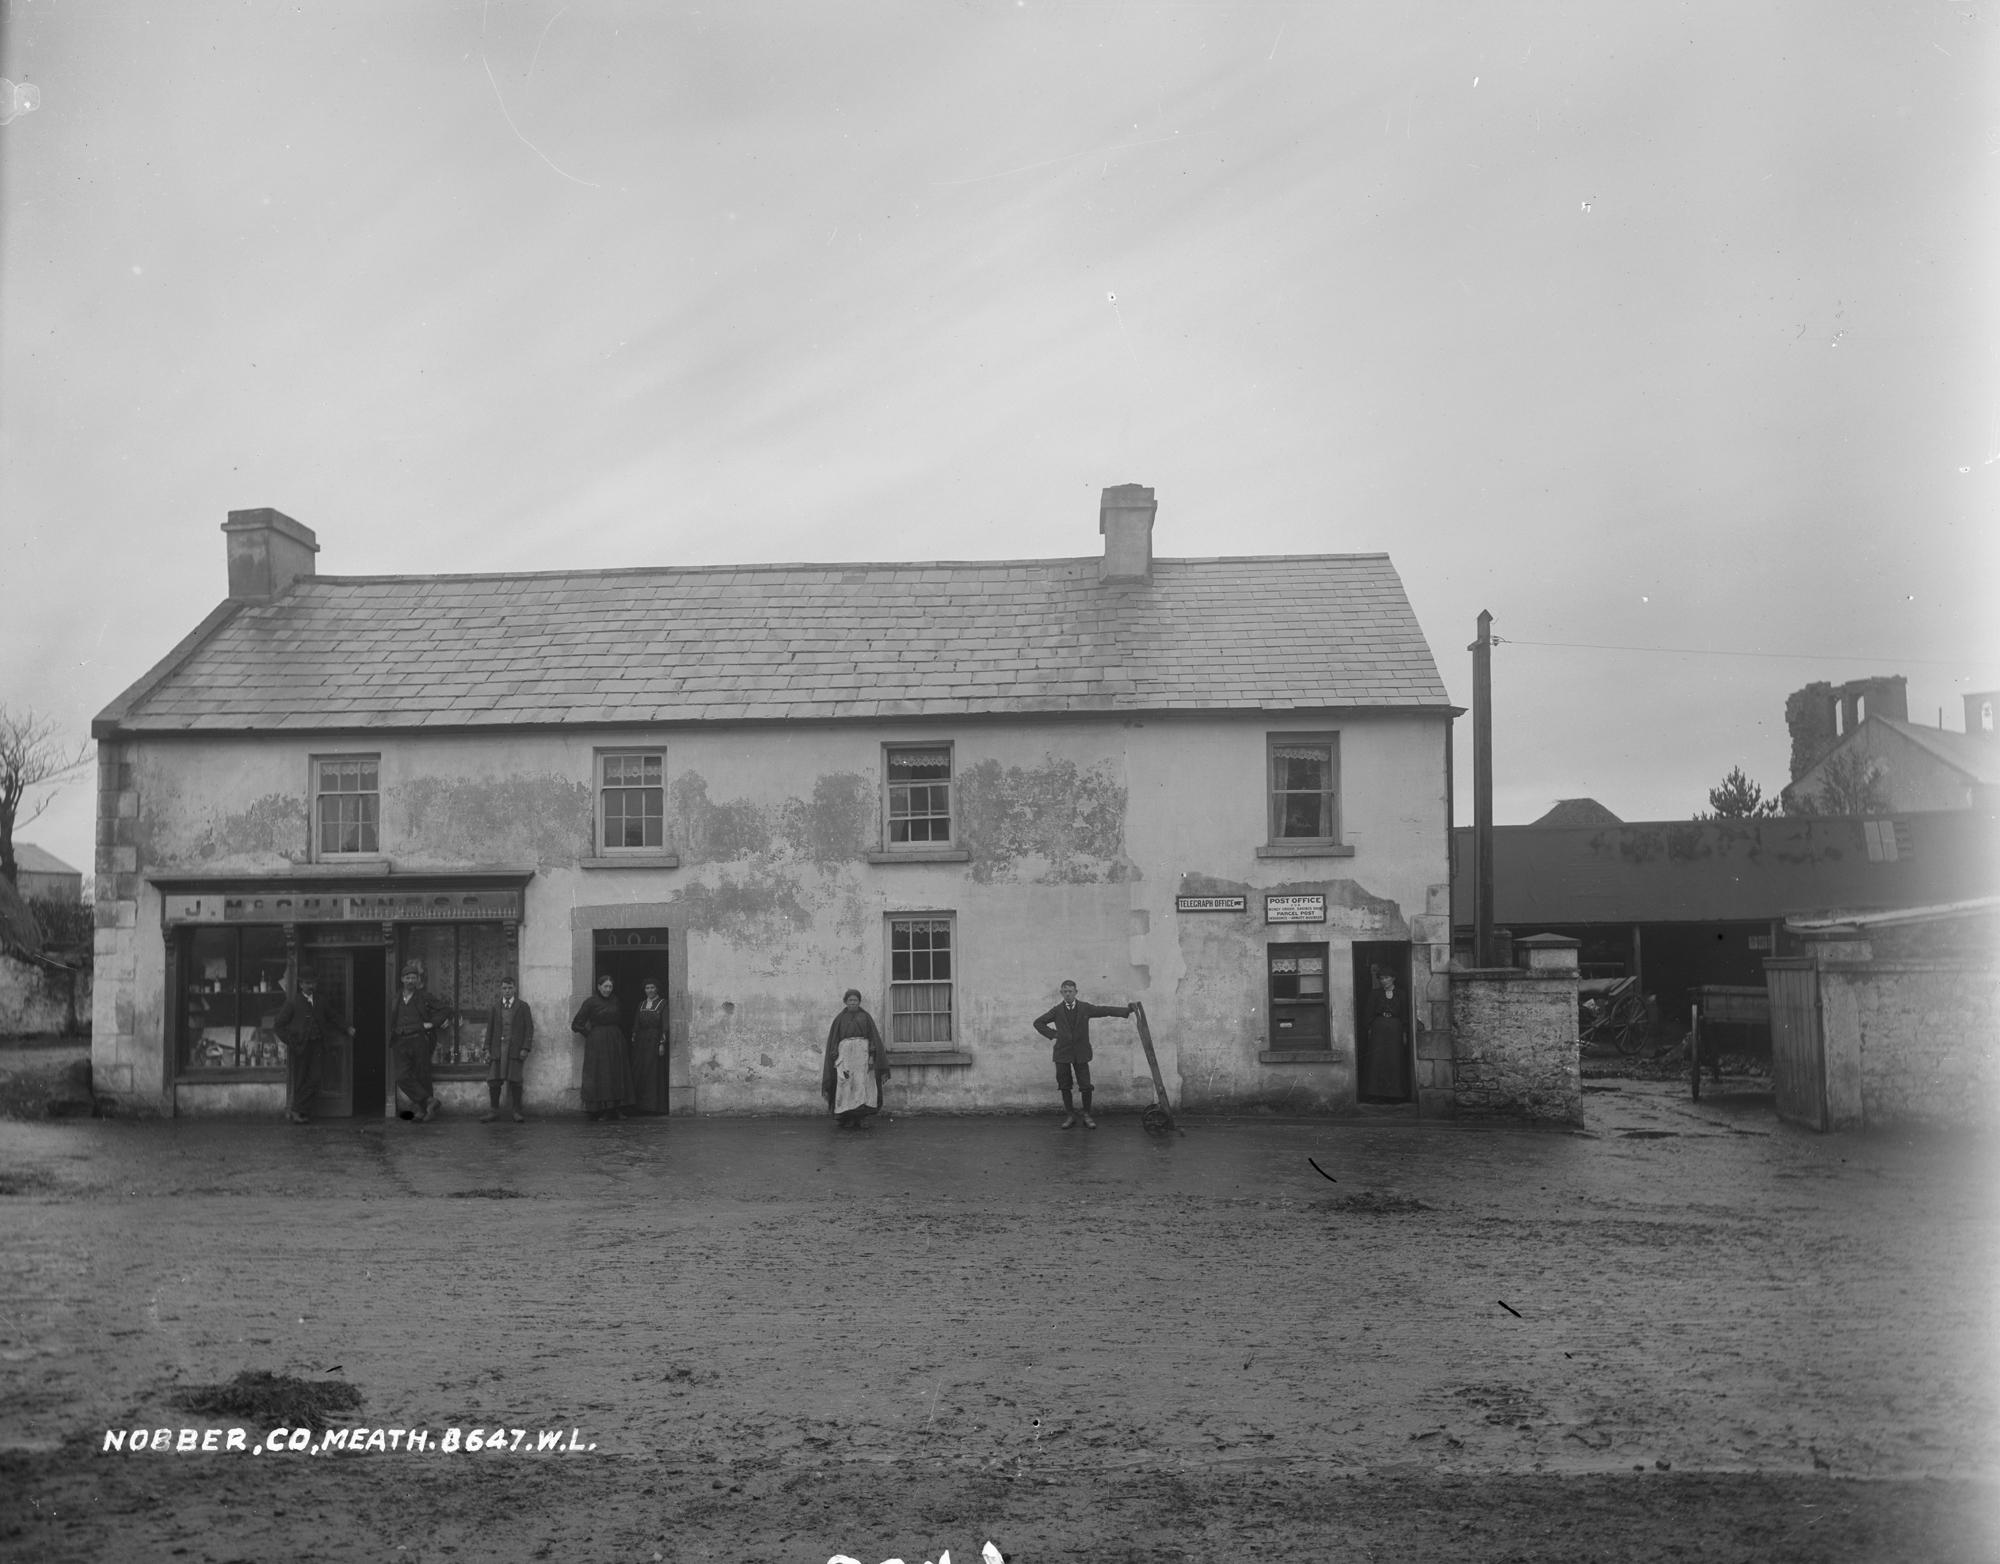 McGuinness's Shop, Nobber, Co. Meath